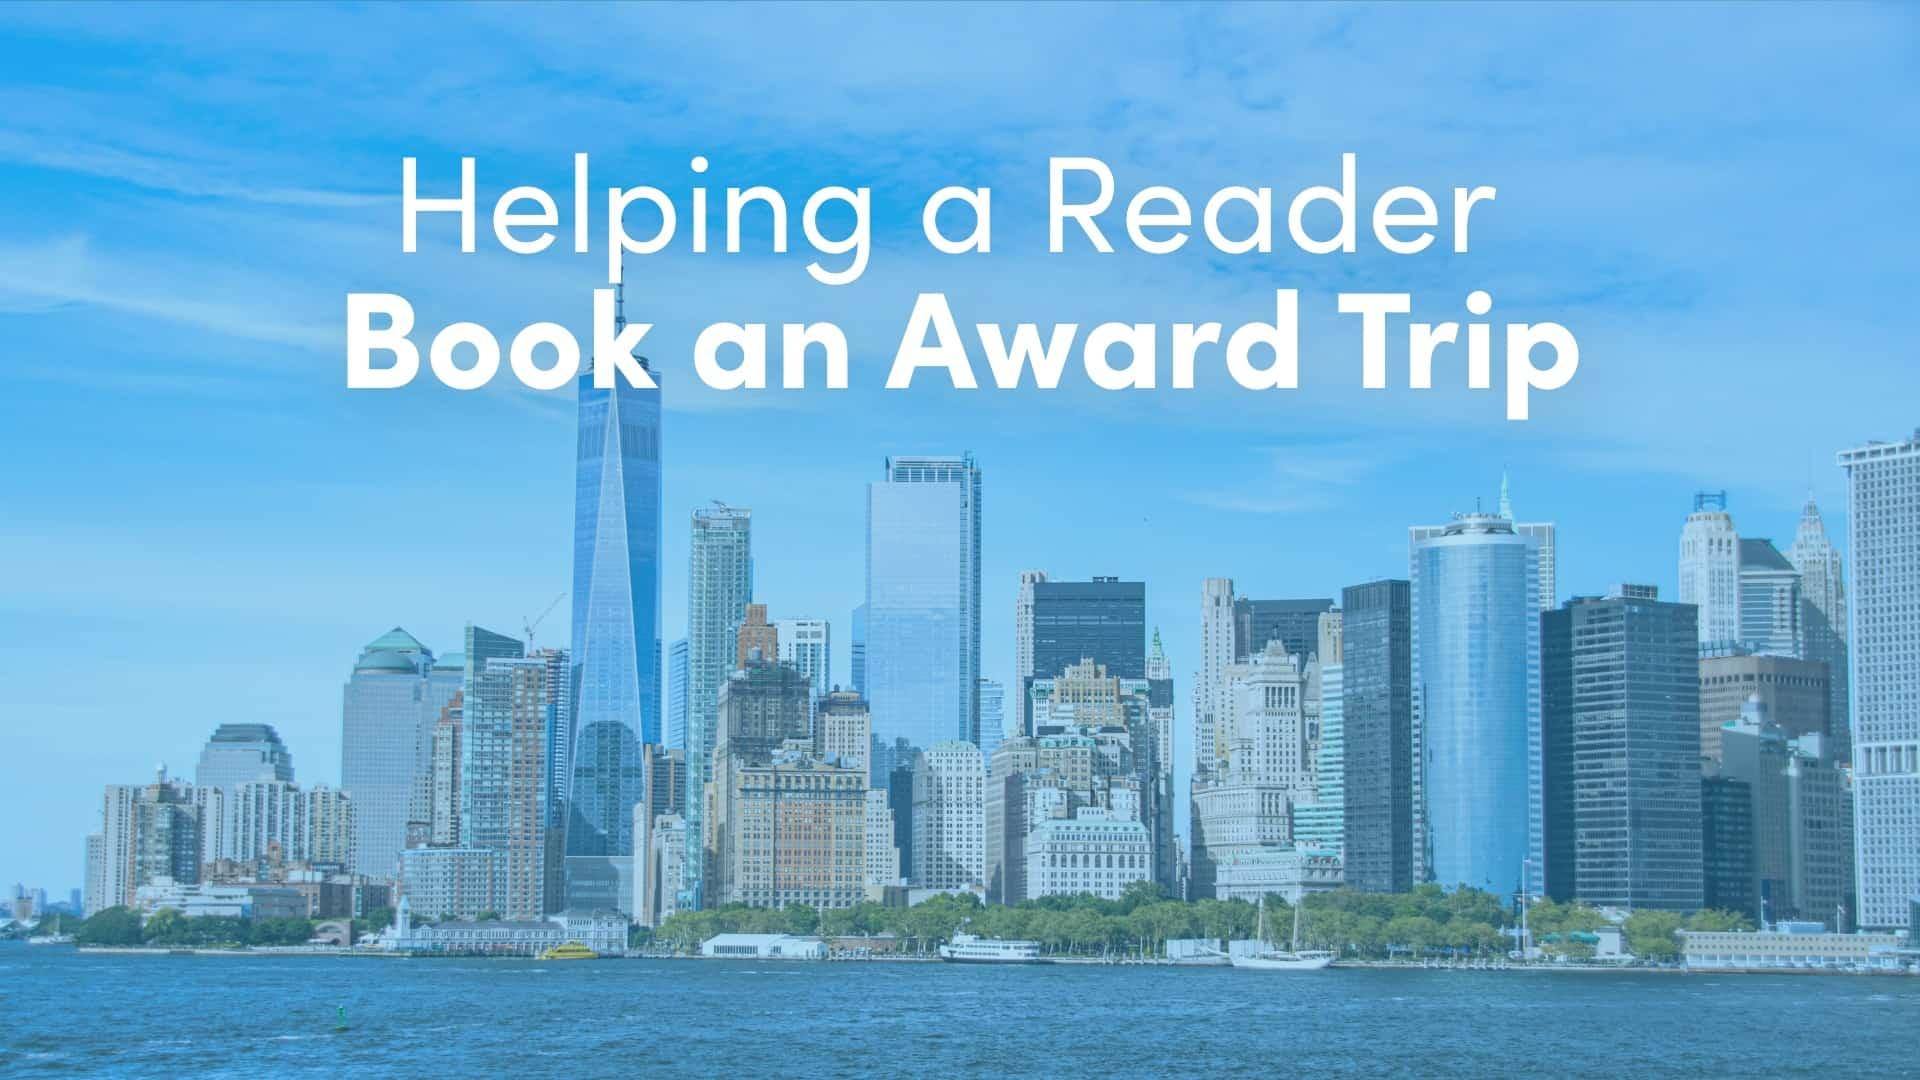 booking an award trip